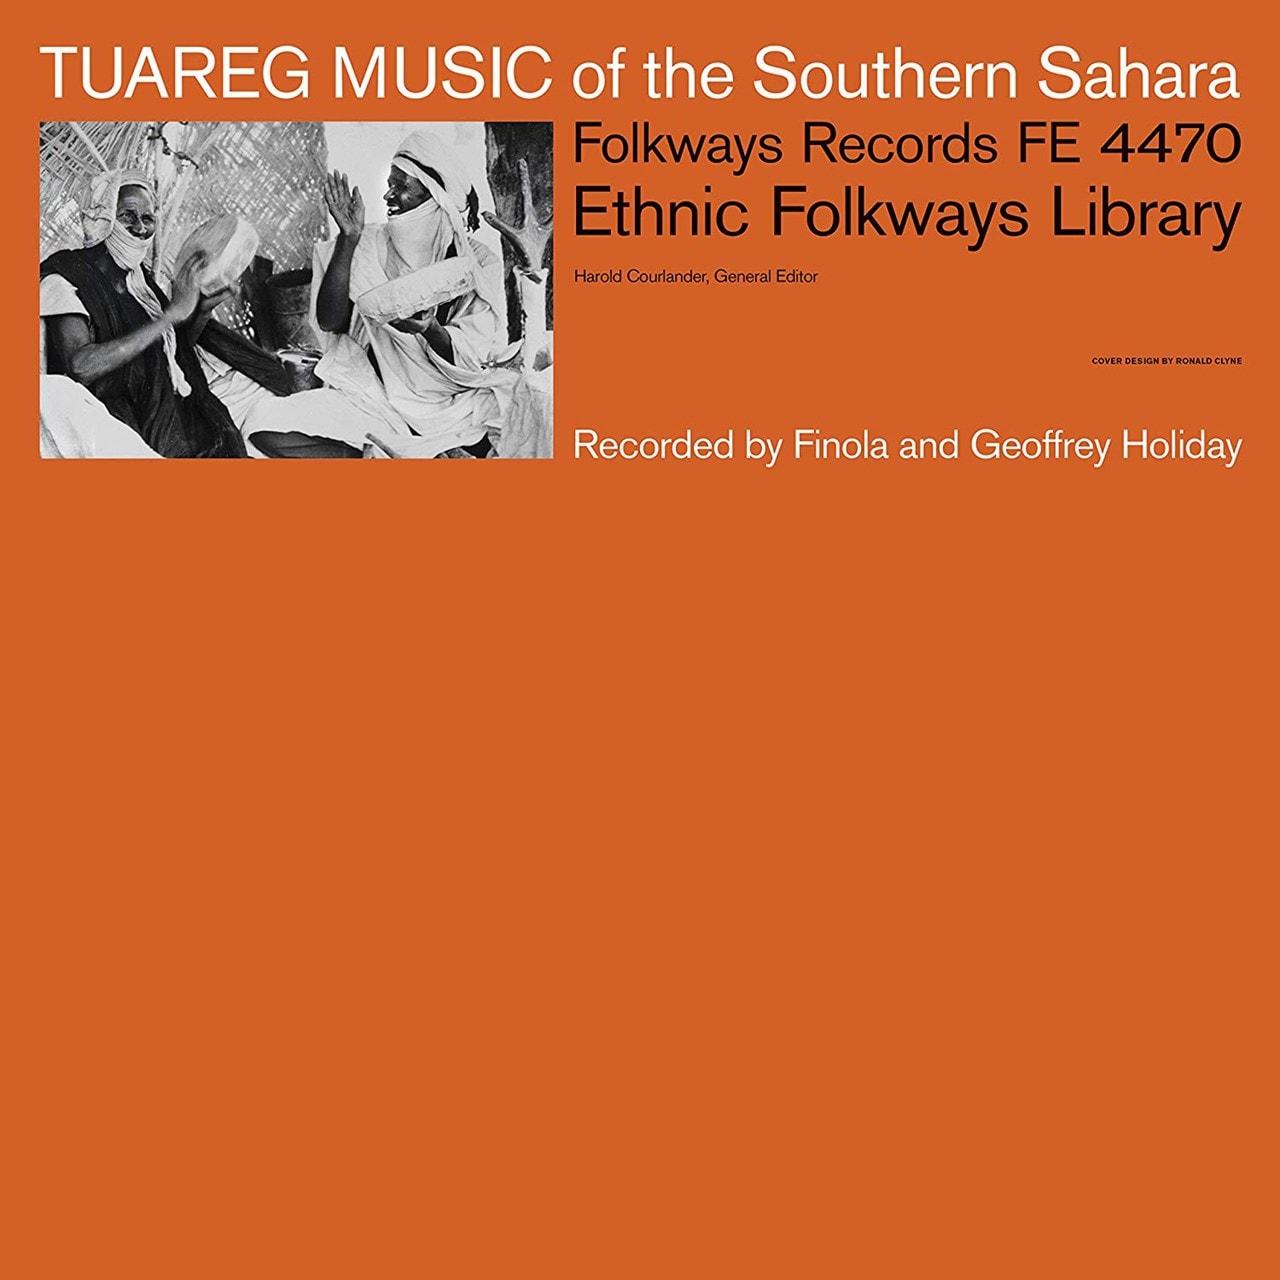 Tuareg Music of the Southern Sahara - 1